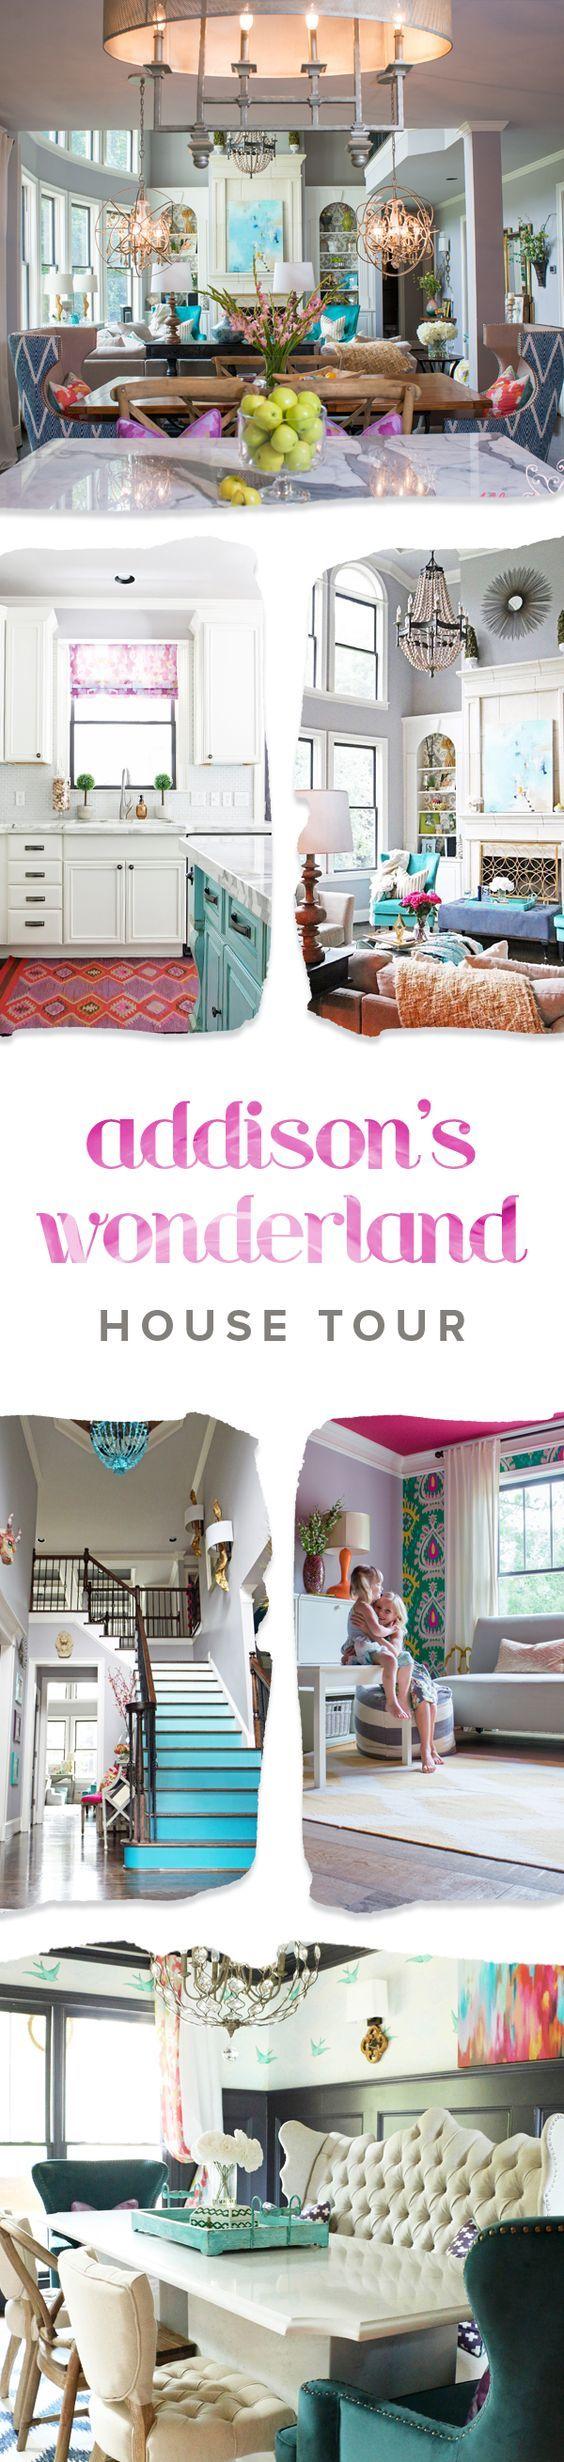 344 best Addison\'s Wonderland Blog images on Pinterest | Wonderland ...